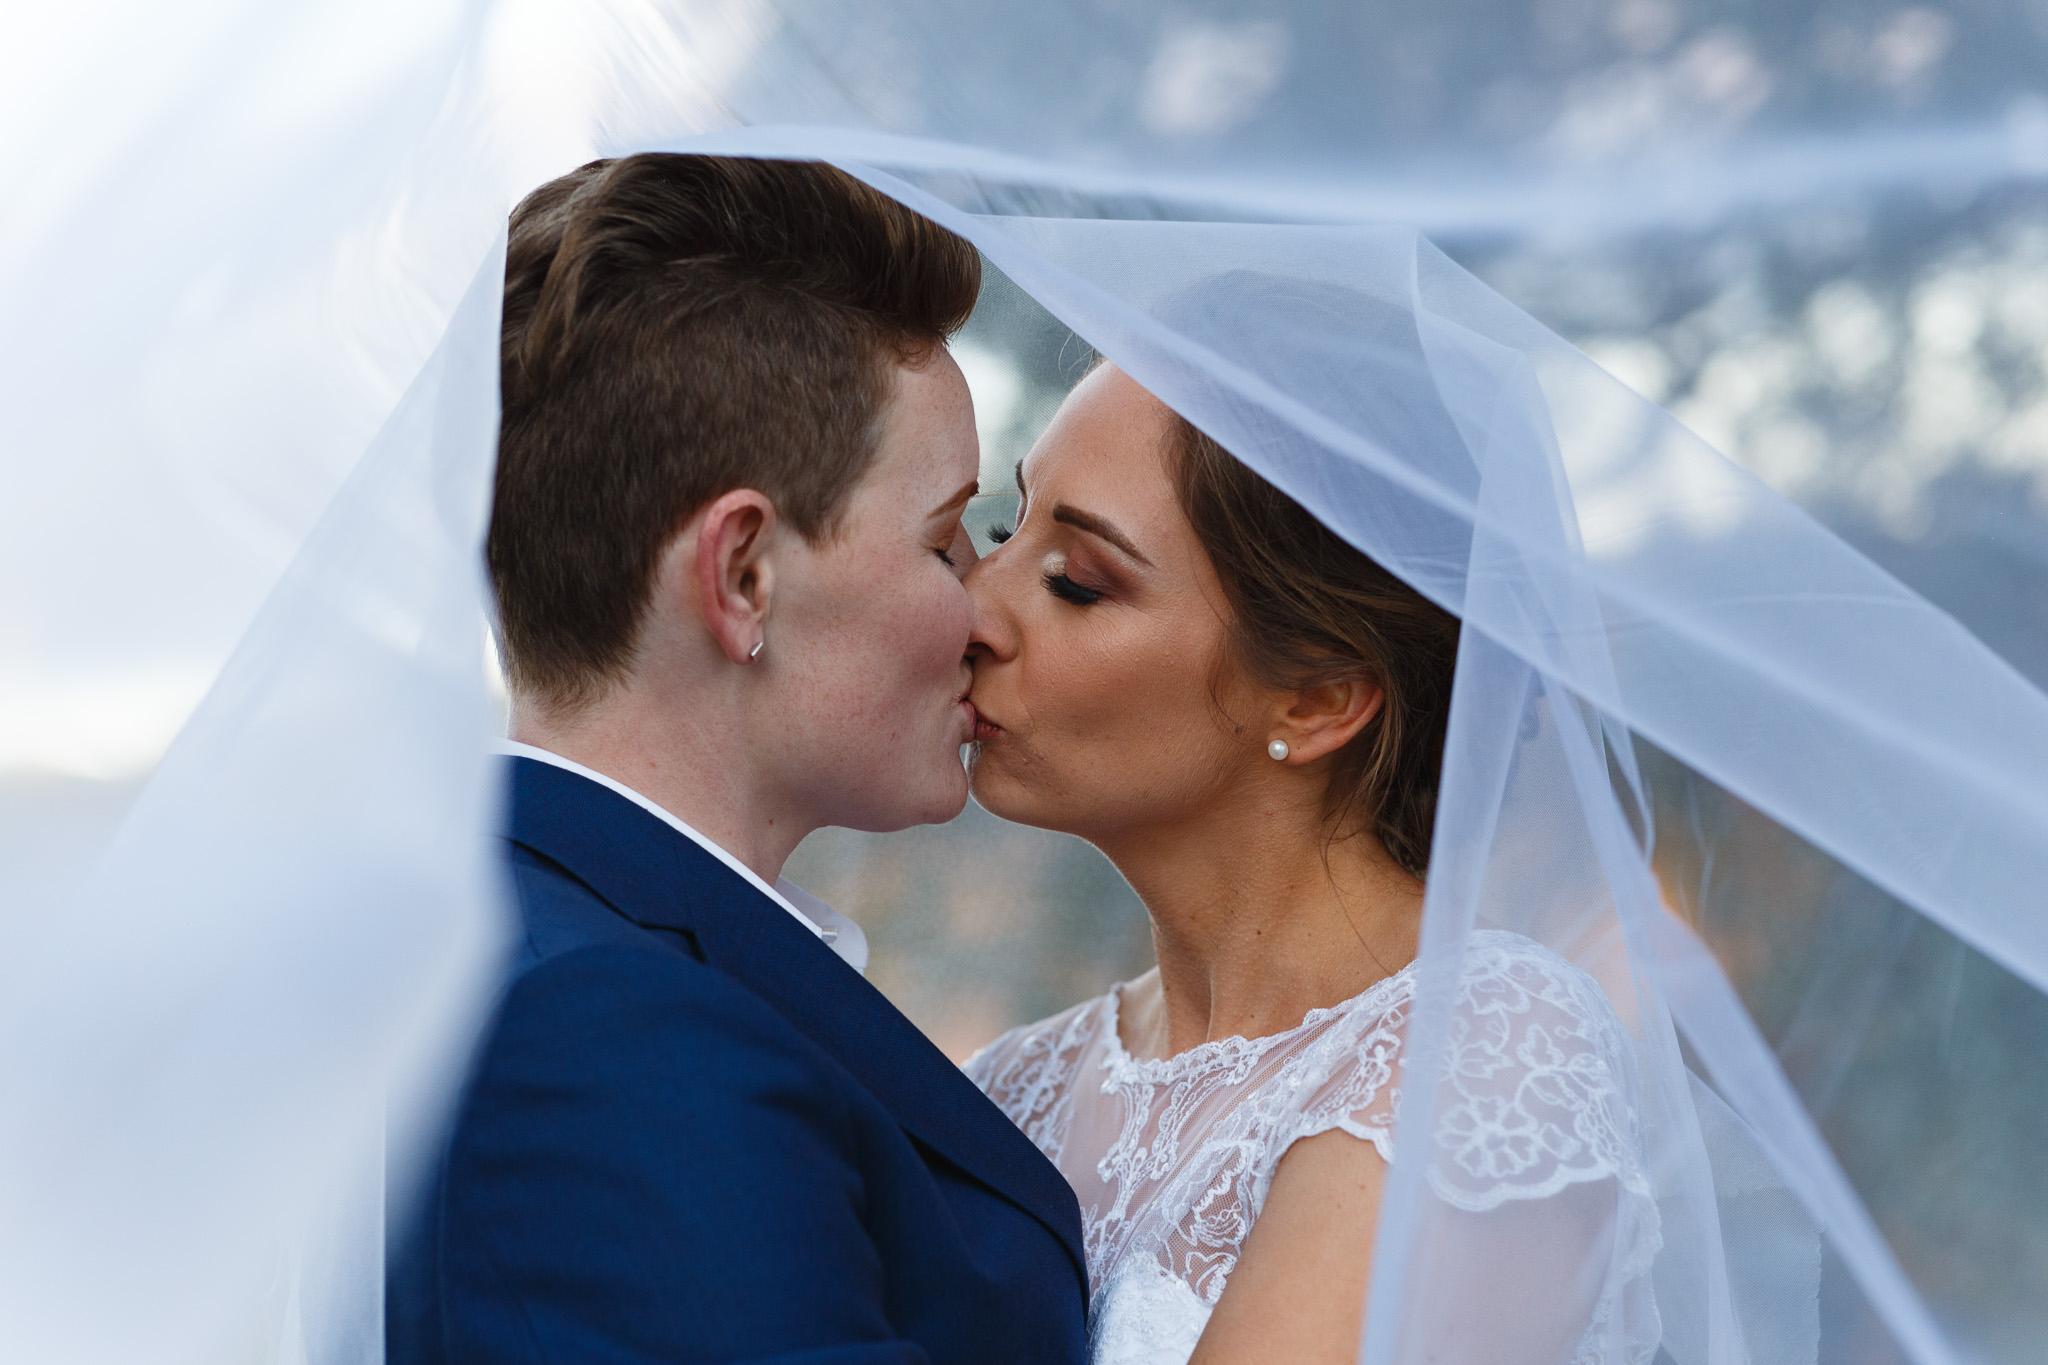 palmerston-north-wedding-photography-highlight-new-zealand.jpg-586.jpg